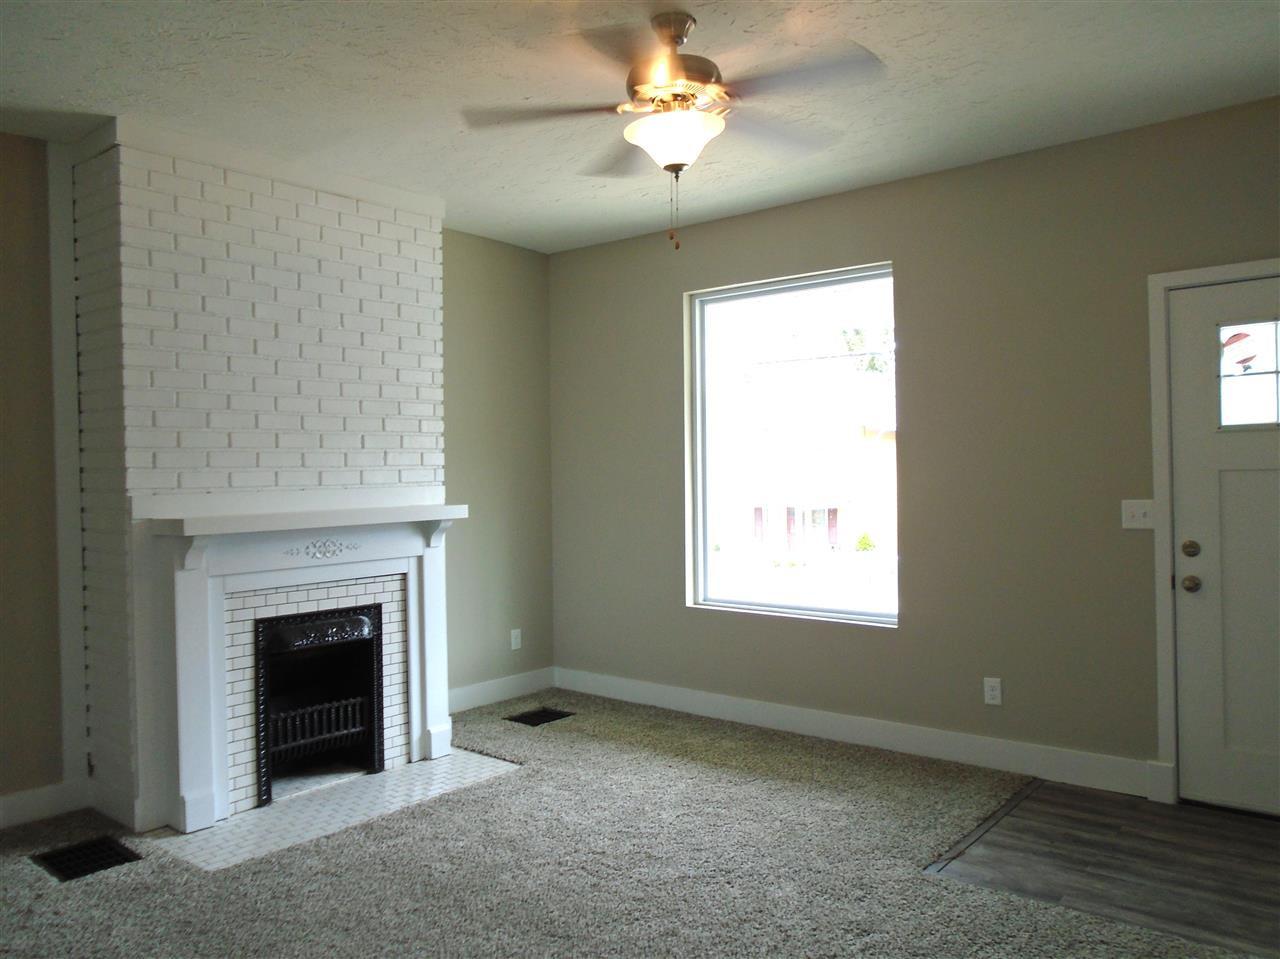 Photo 2 for 926 Maple Ave Dayton, KY 41074